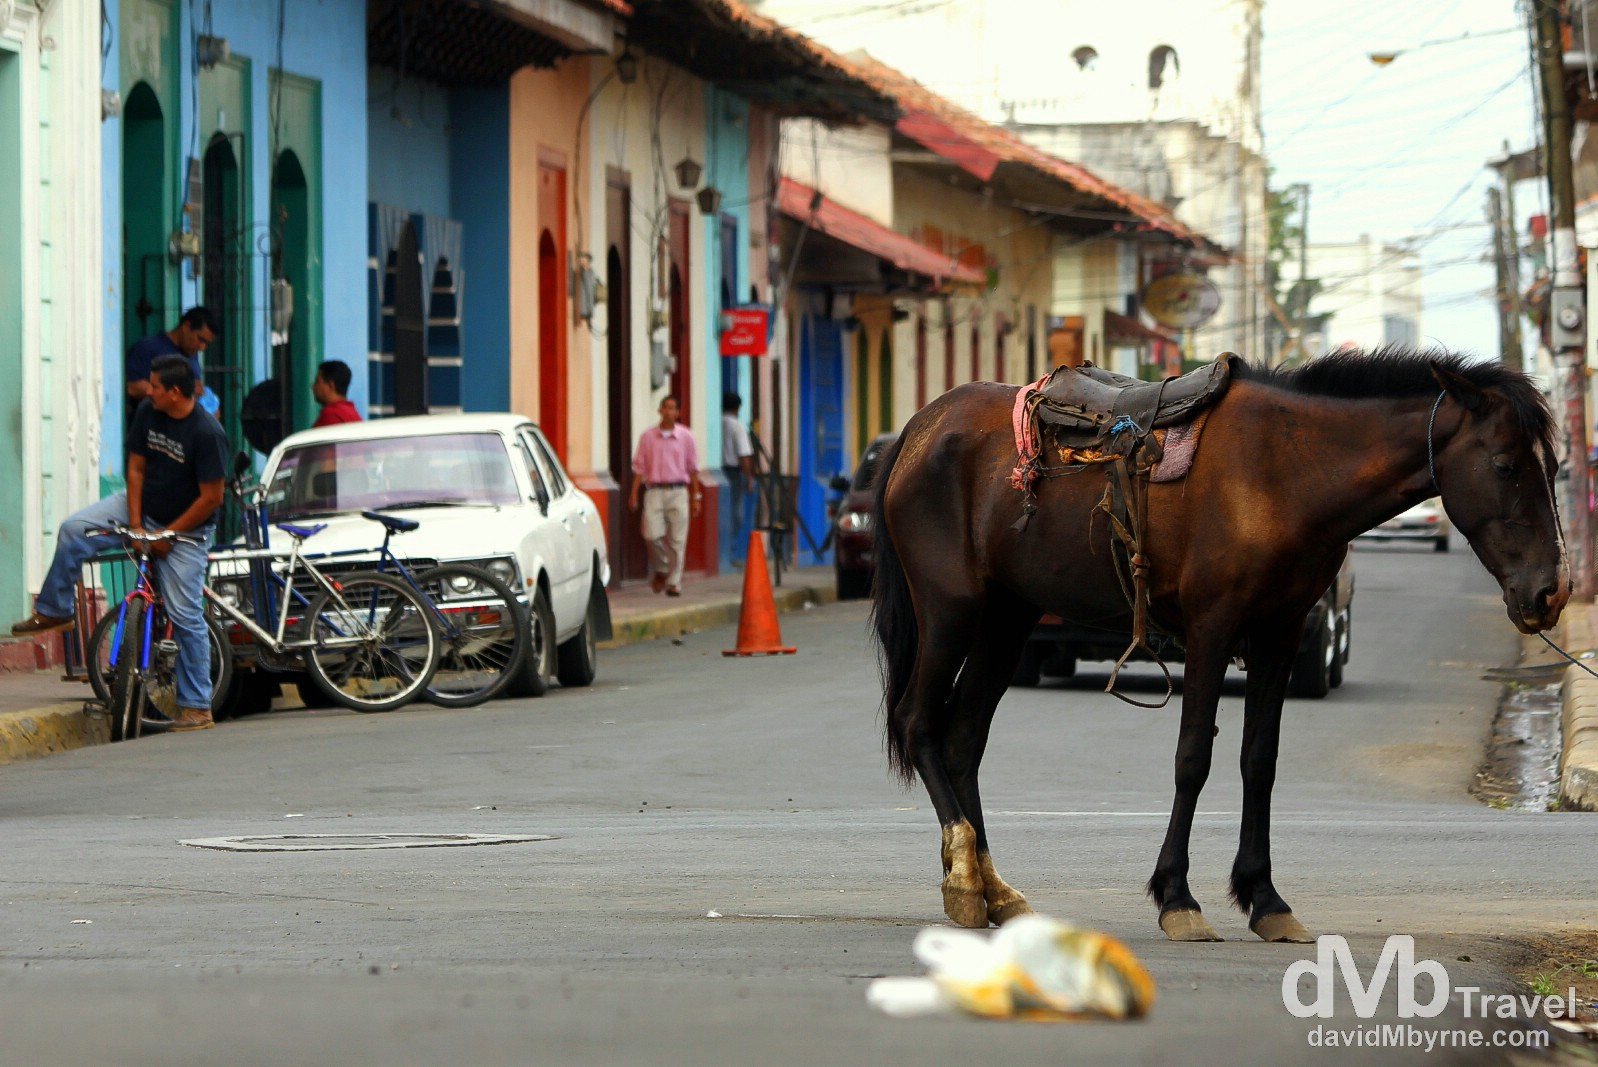 Calle Central Ruben Dario, Leon, Nicaragua. June 15th 2013.